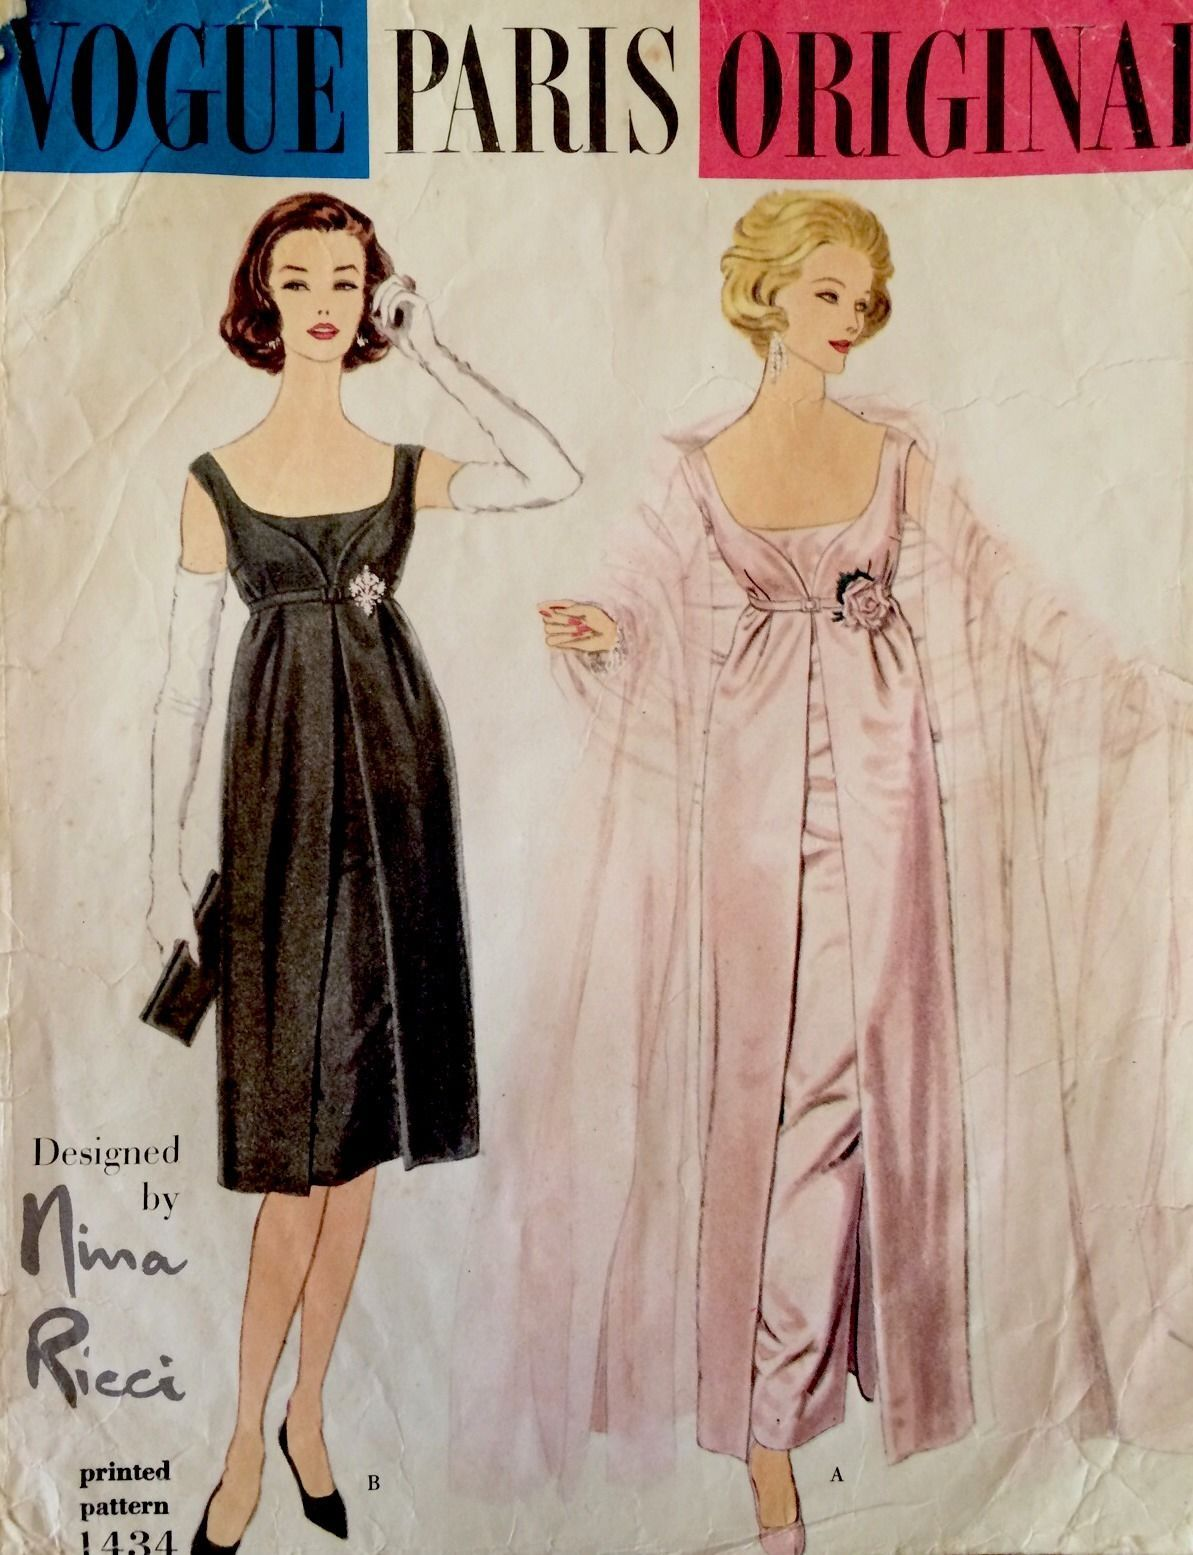 1950s Vintage Vogue Paris Original Nina Ricci Evening Dress Sewing ...